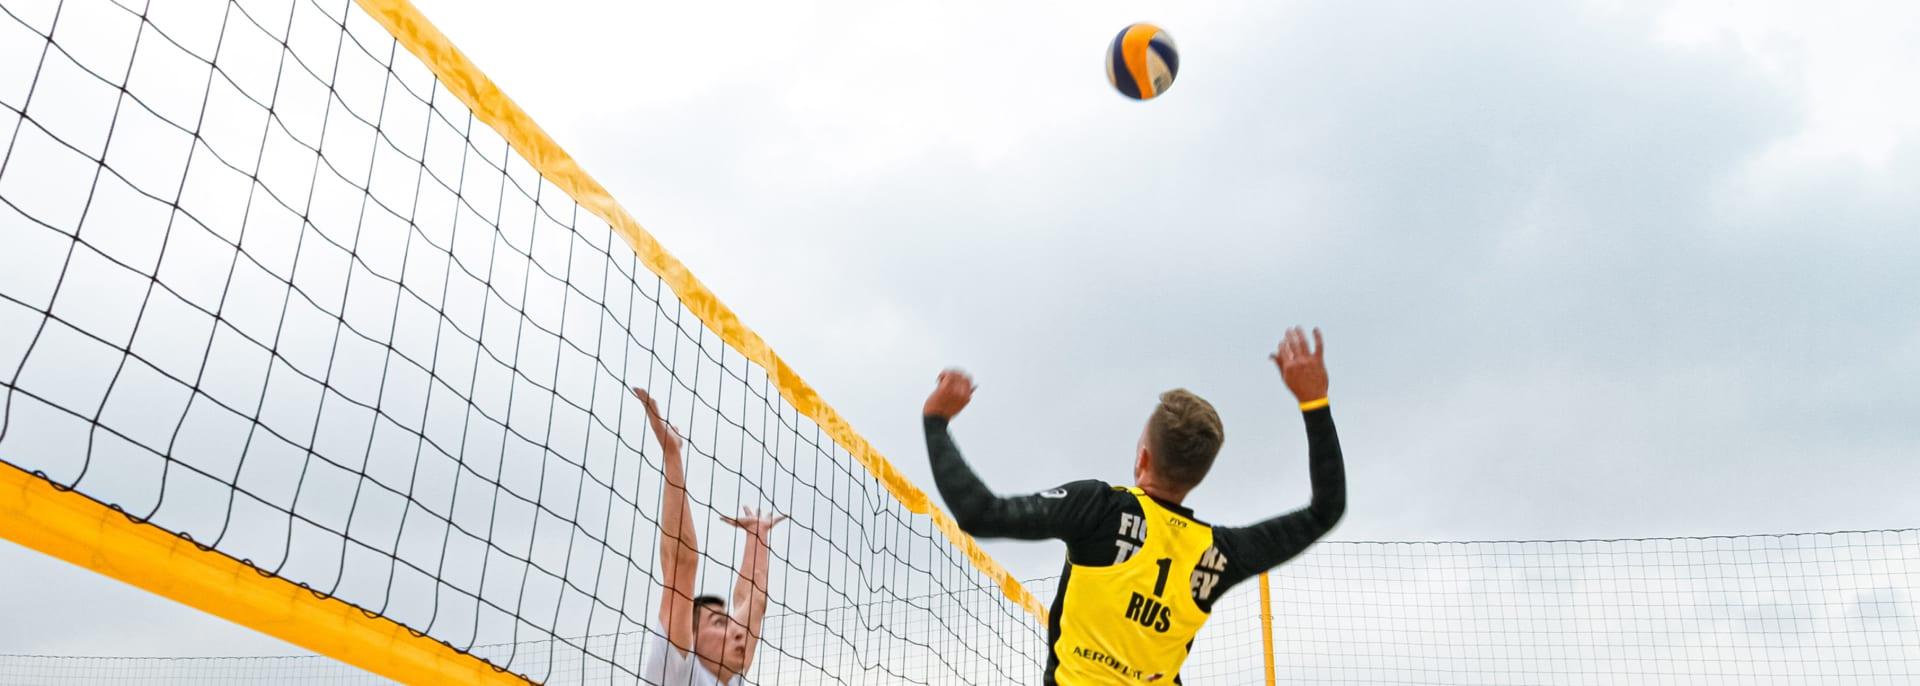 Beachvolleyball, Sport Live Reisen, Knecht Reisen